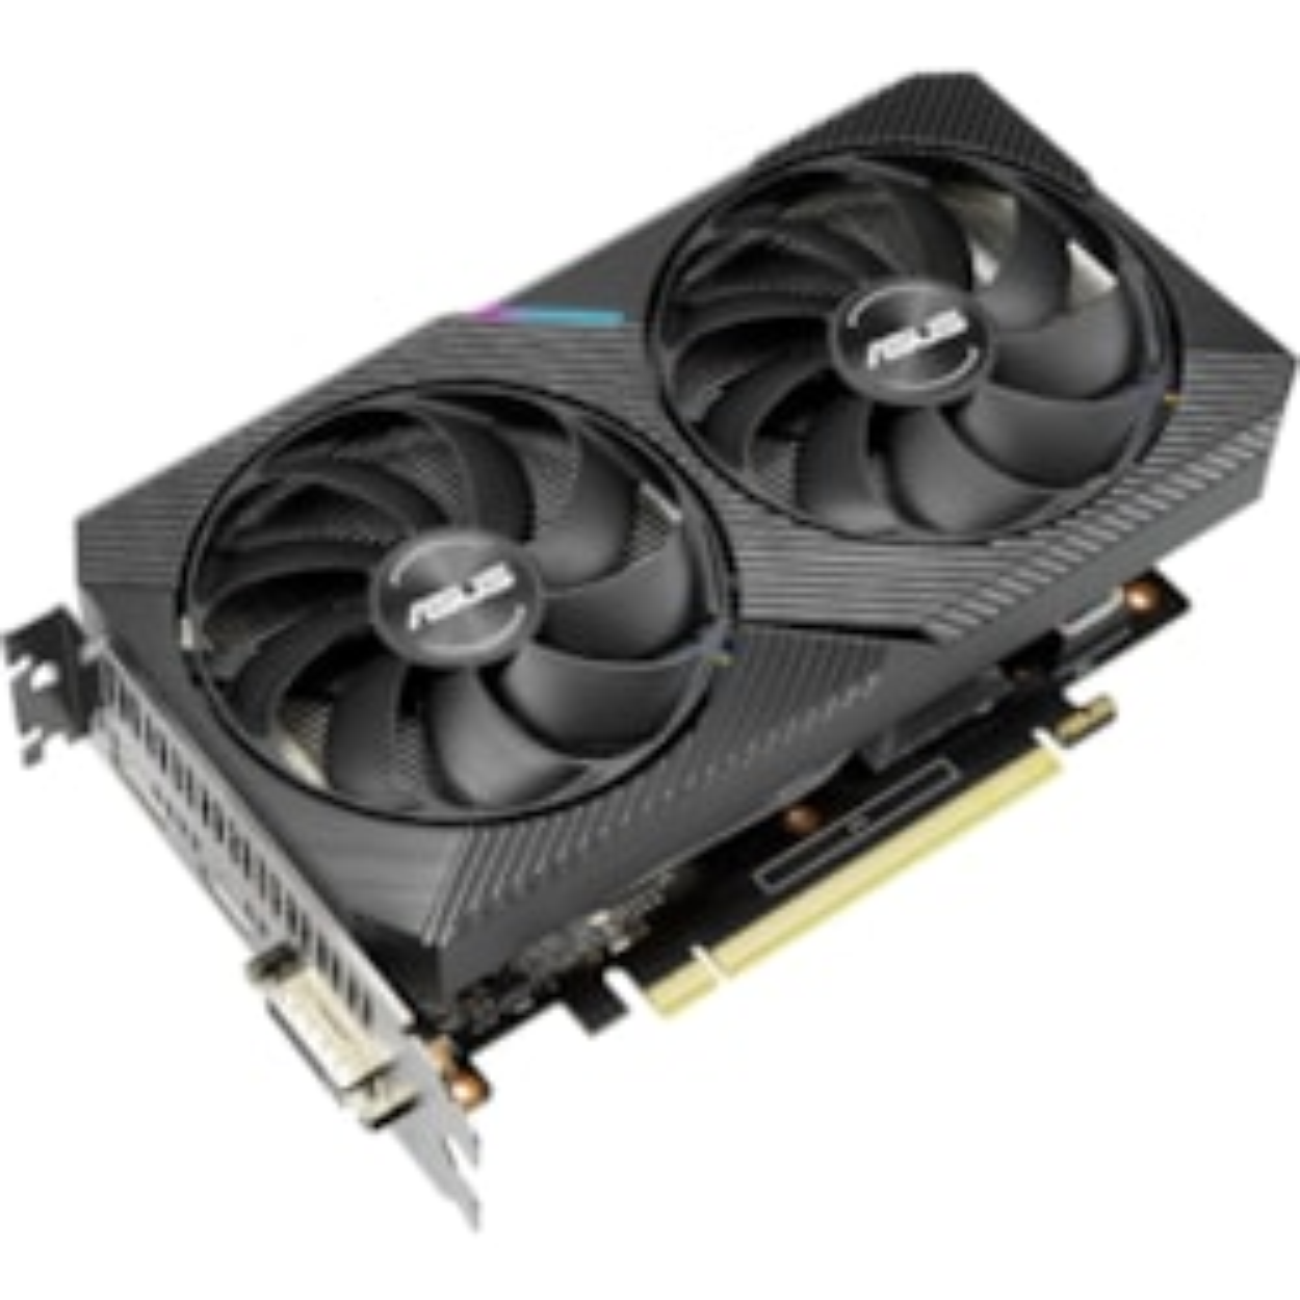 Asus Dual DUAL-RTX2070-O8G-MINI GeForce RTX 2070 Graphic Card - 8 GB GDDR6